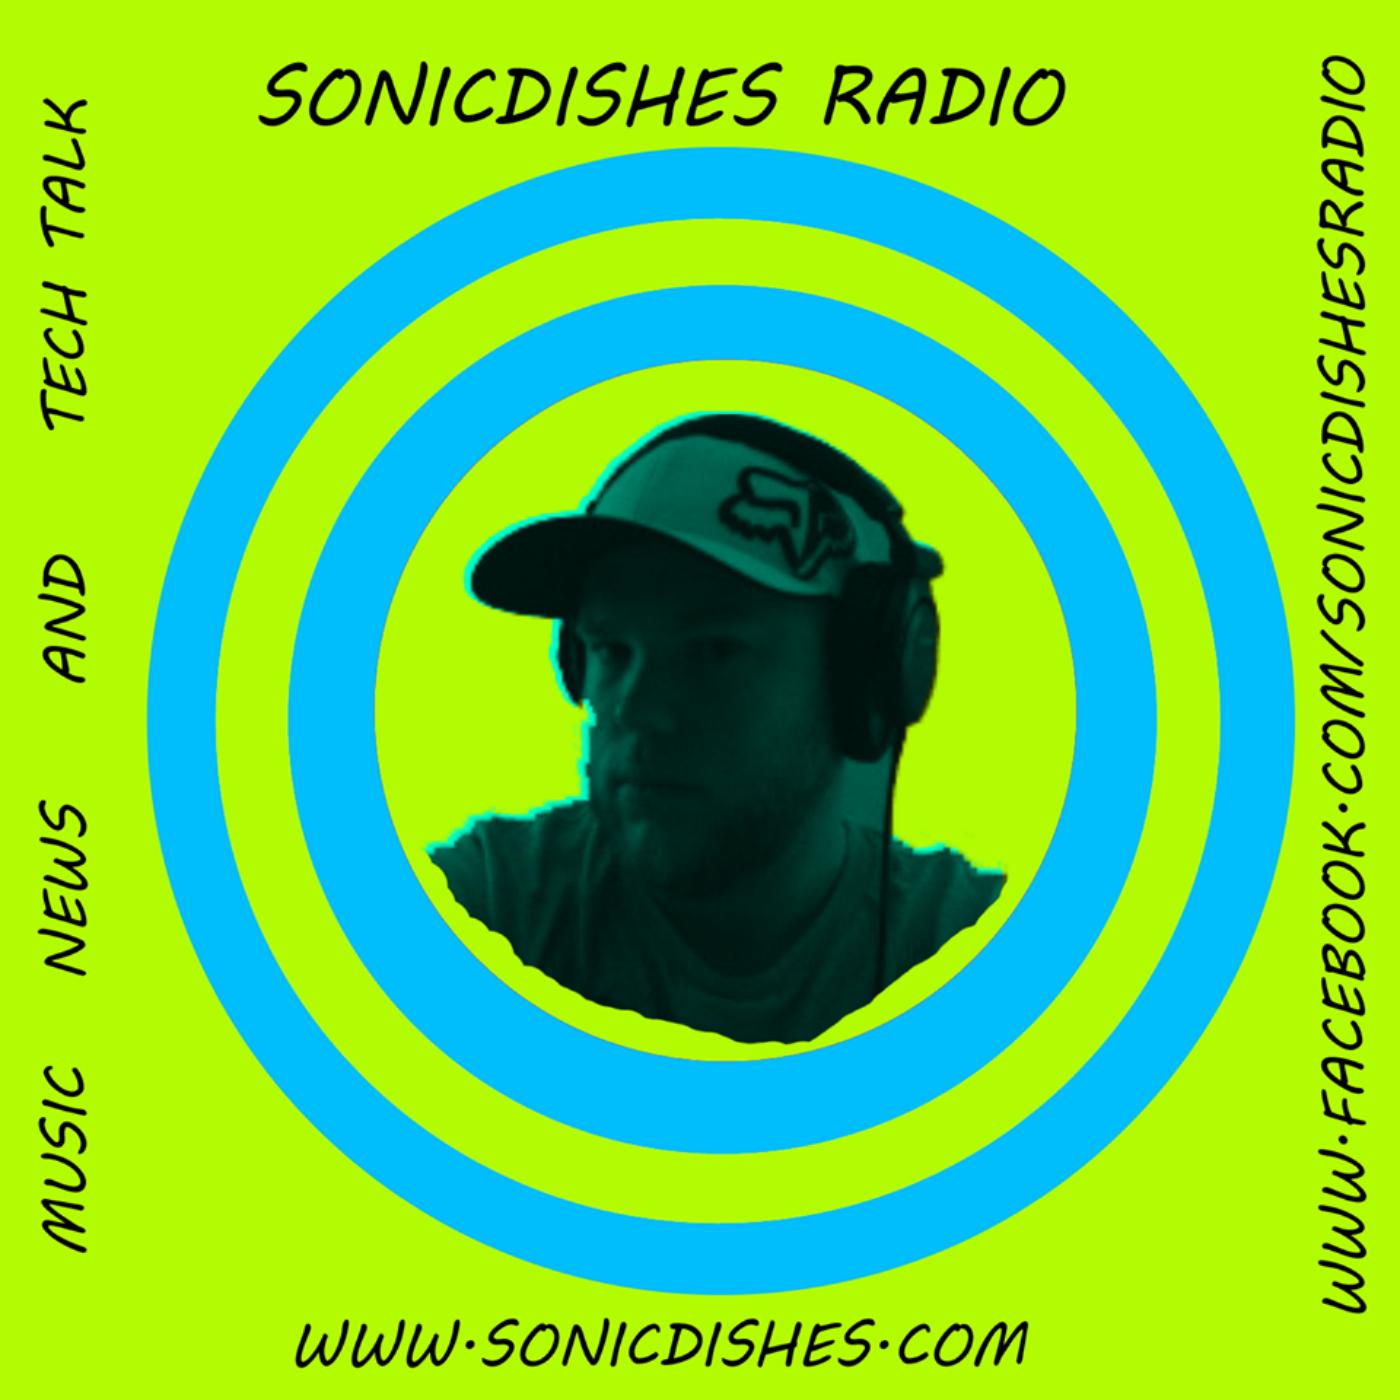 SonicDishesRadio